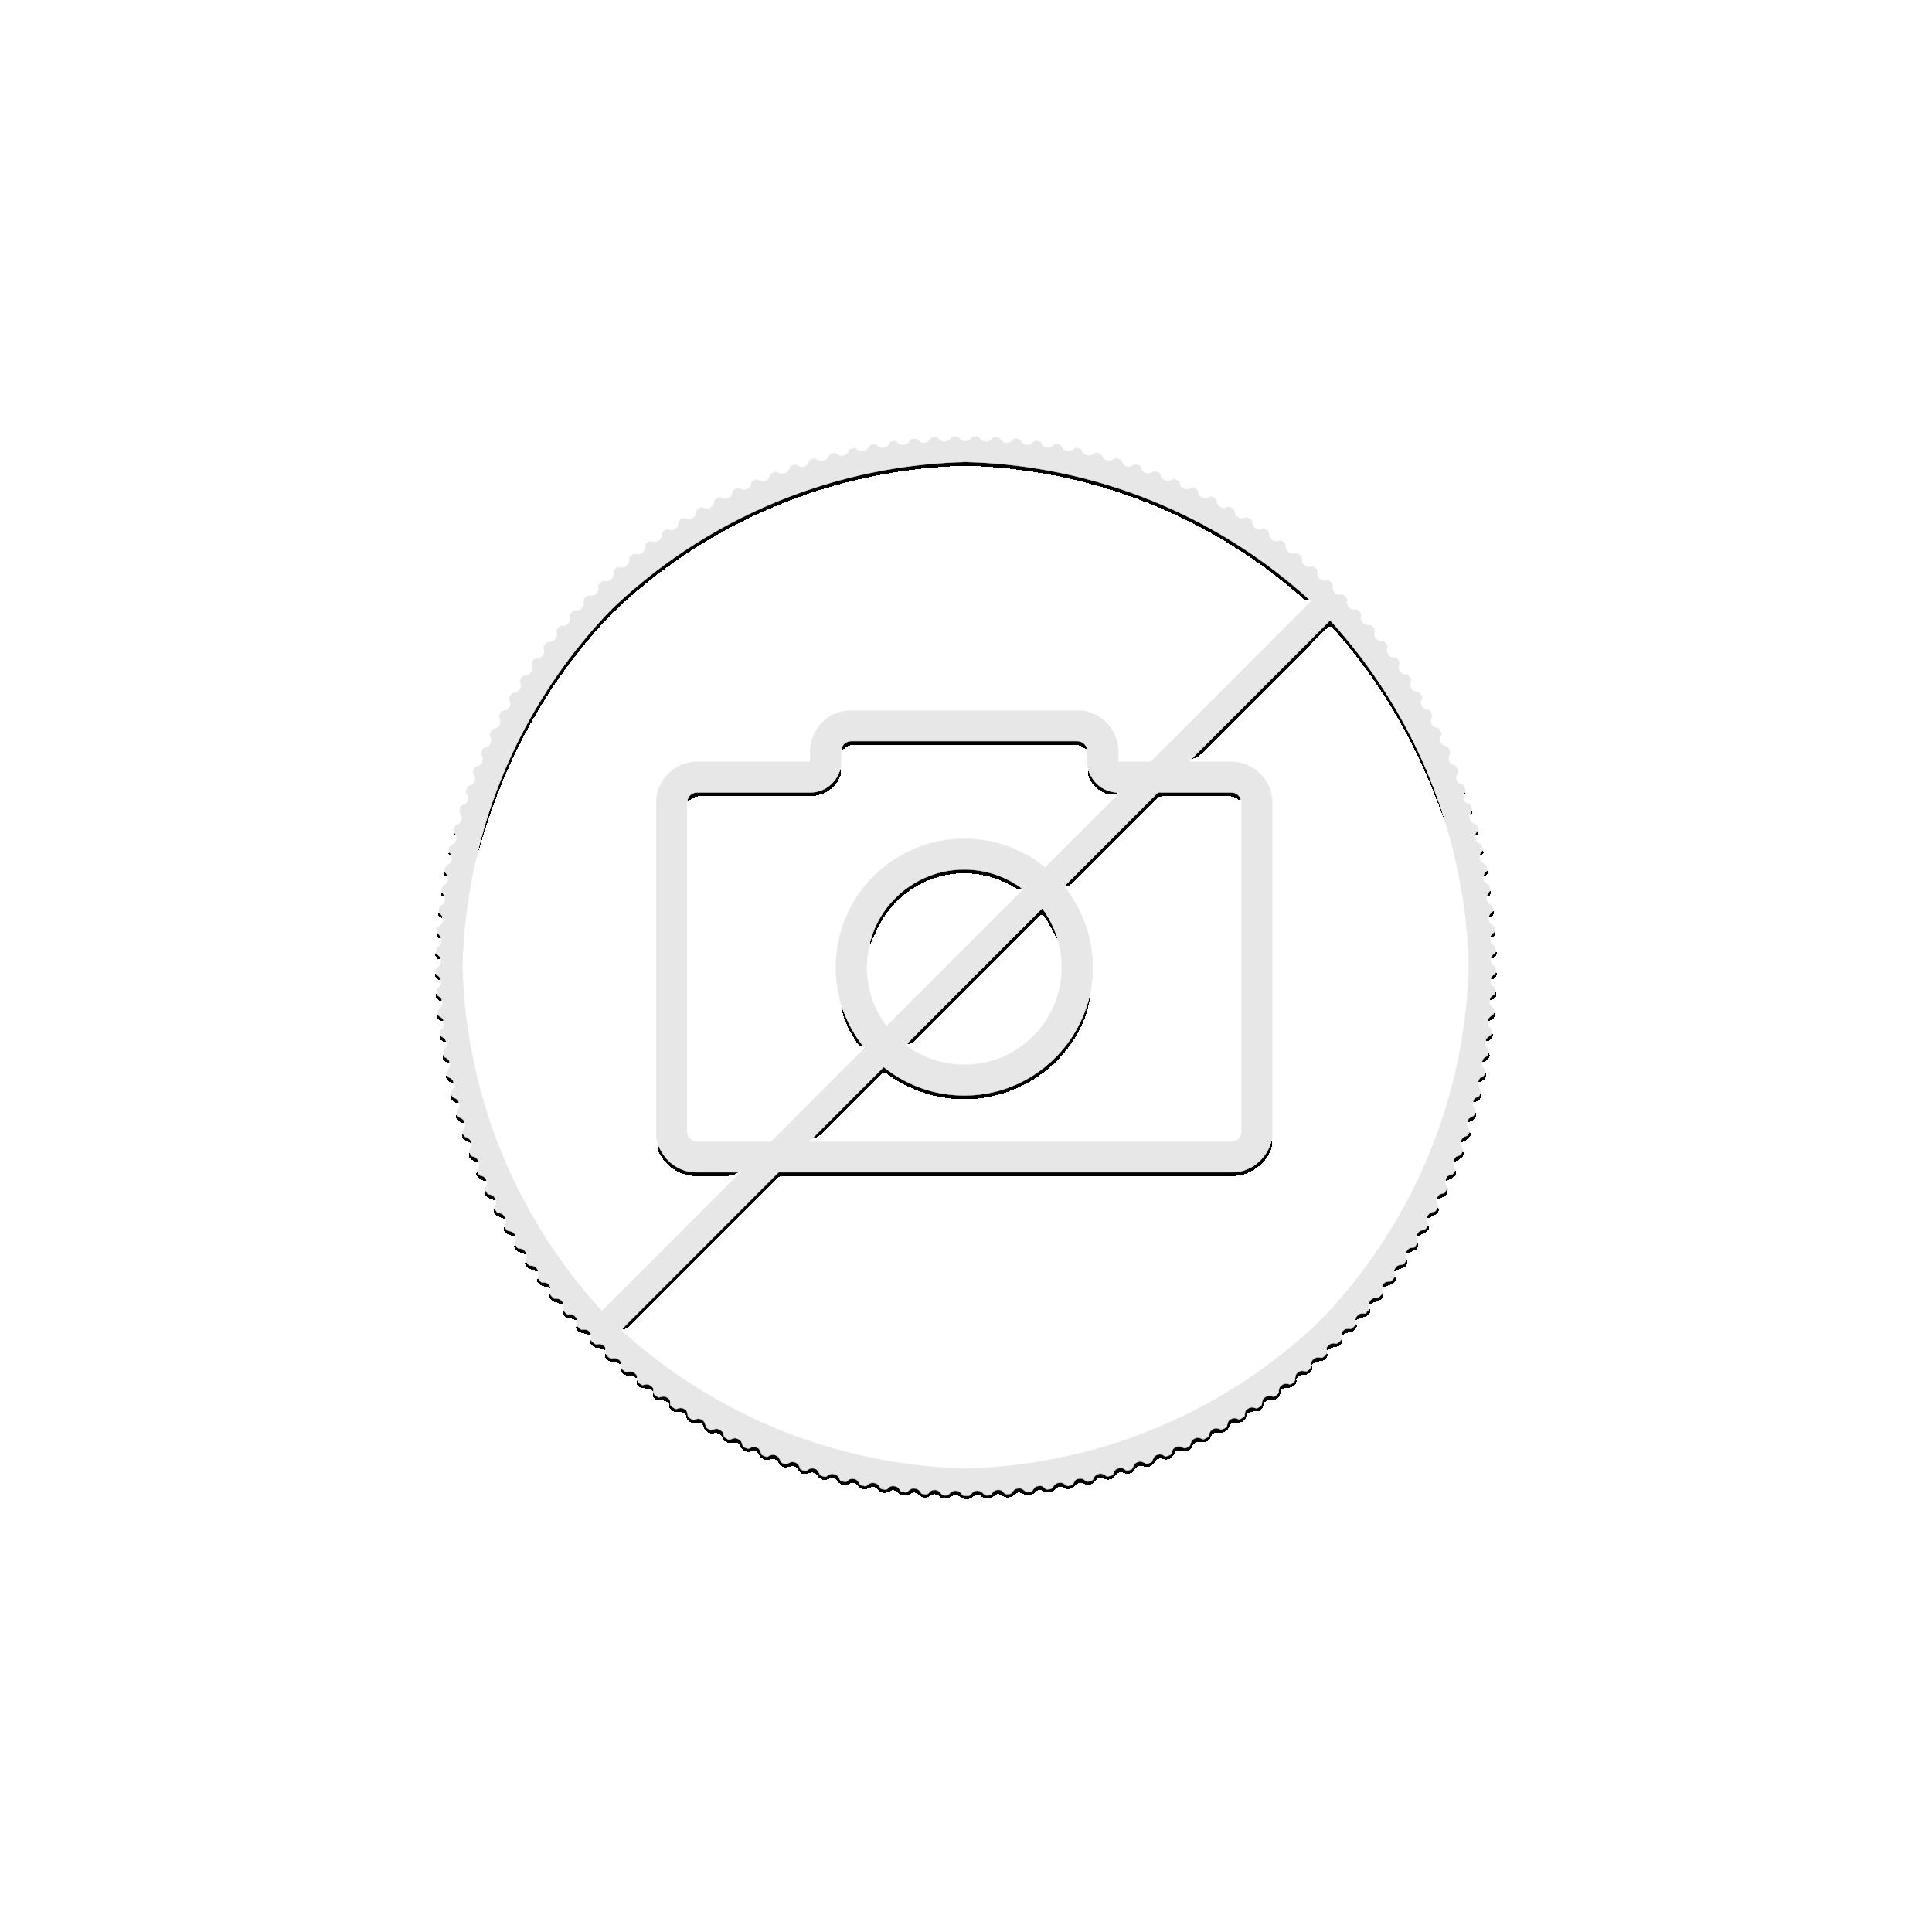 1 Troy ounce zilveren munt Golden Ring - Silver Eagle 2019